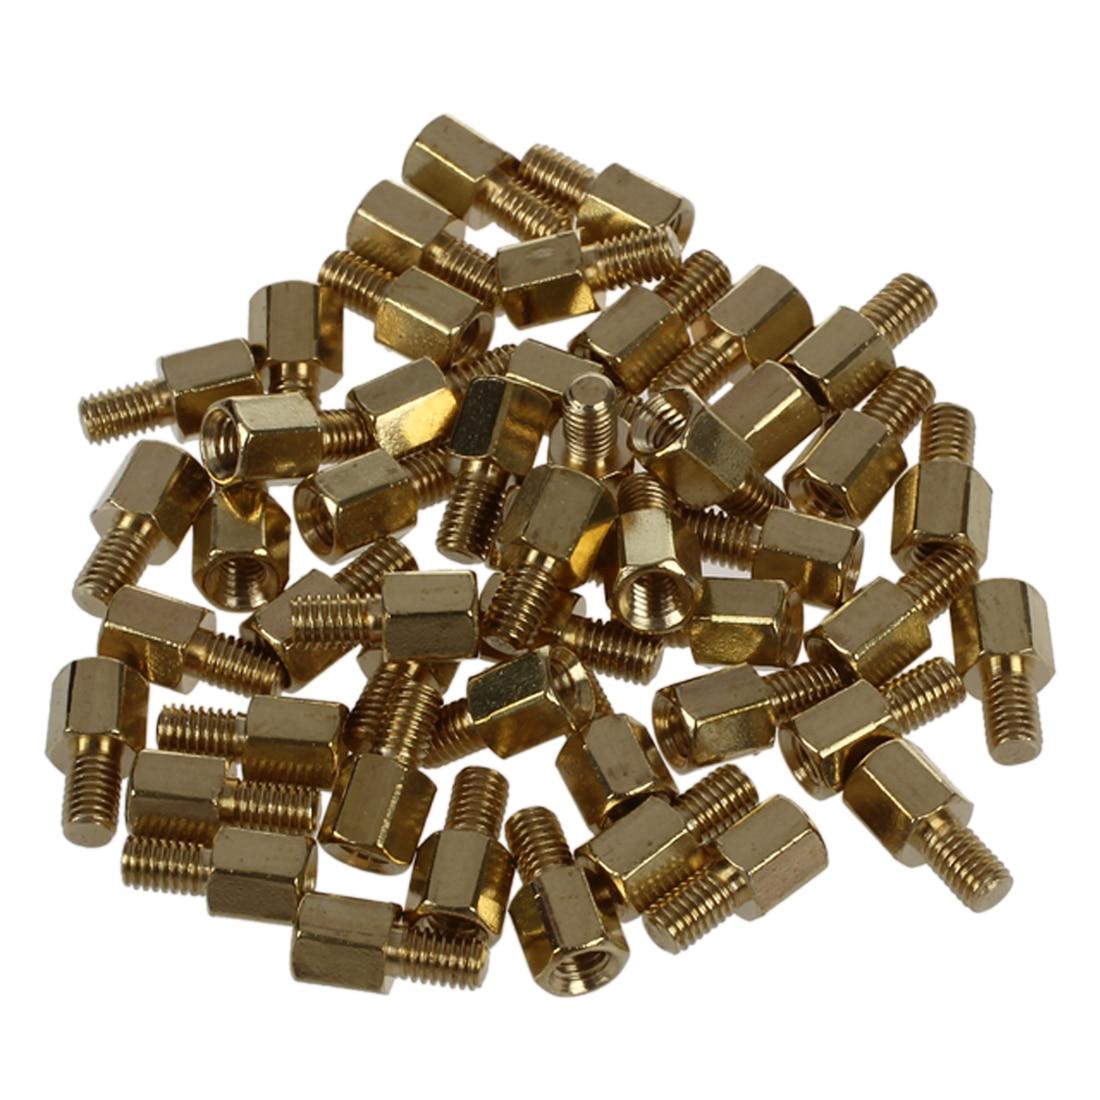 50 Pcs Brass Screw PCB Standoffs Hexagonal Spacers M3 Male X M3 Female 5mm